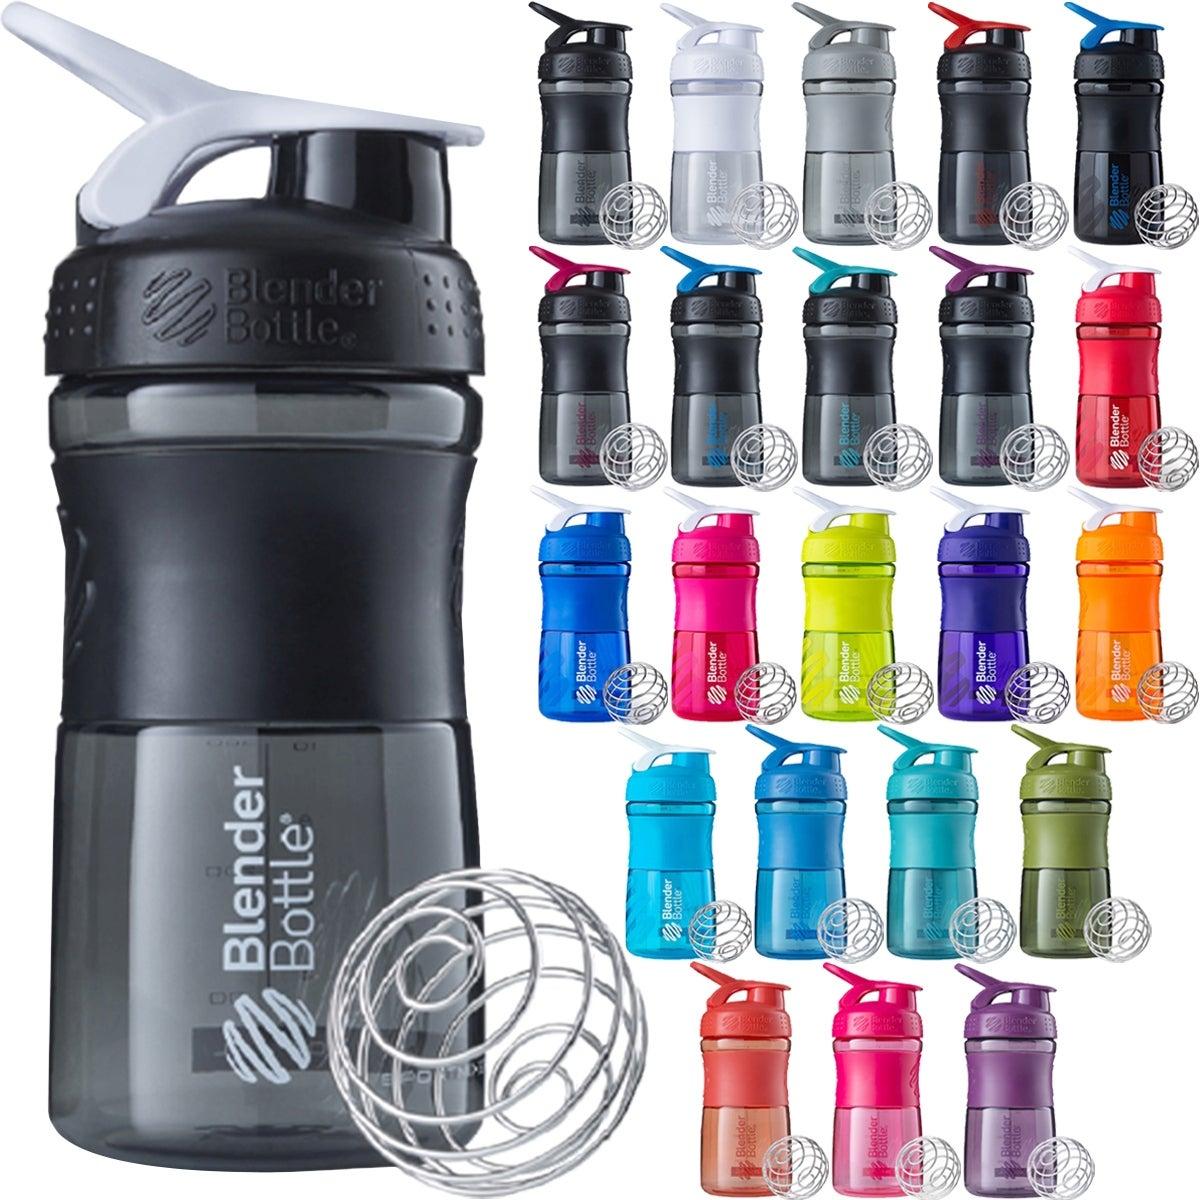 Shop Blender Bottle Sportmixer 20 Oz Tritan Grip Shaker Free Shake And Take 3 2 Shipping On Orders Over 45 16119257